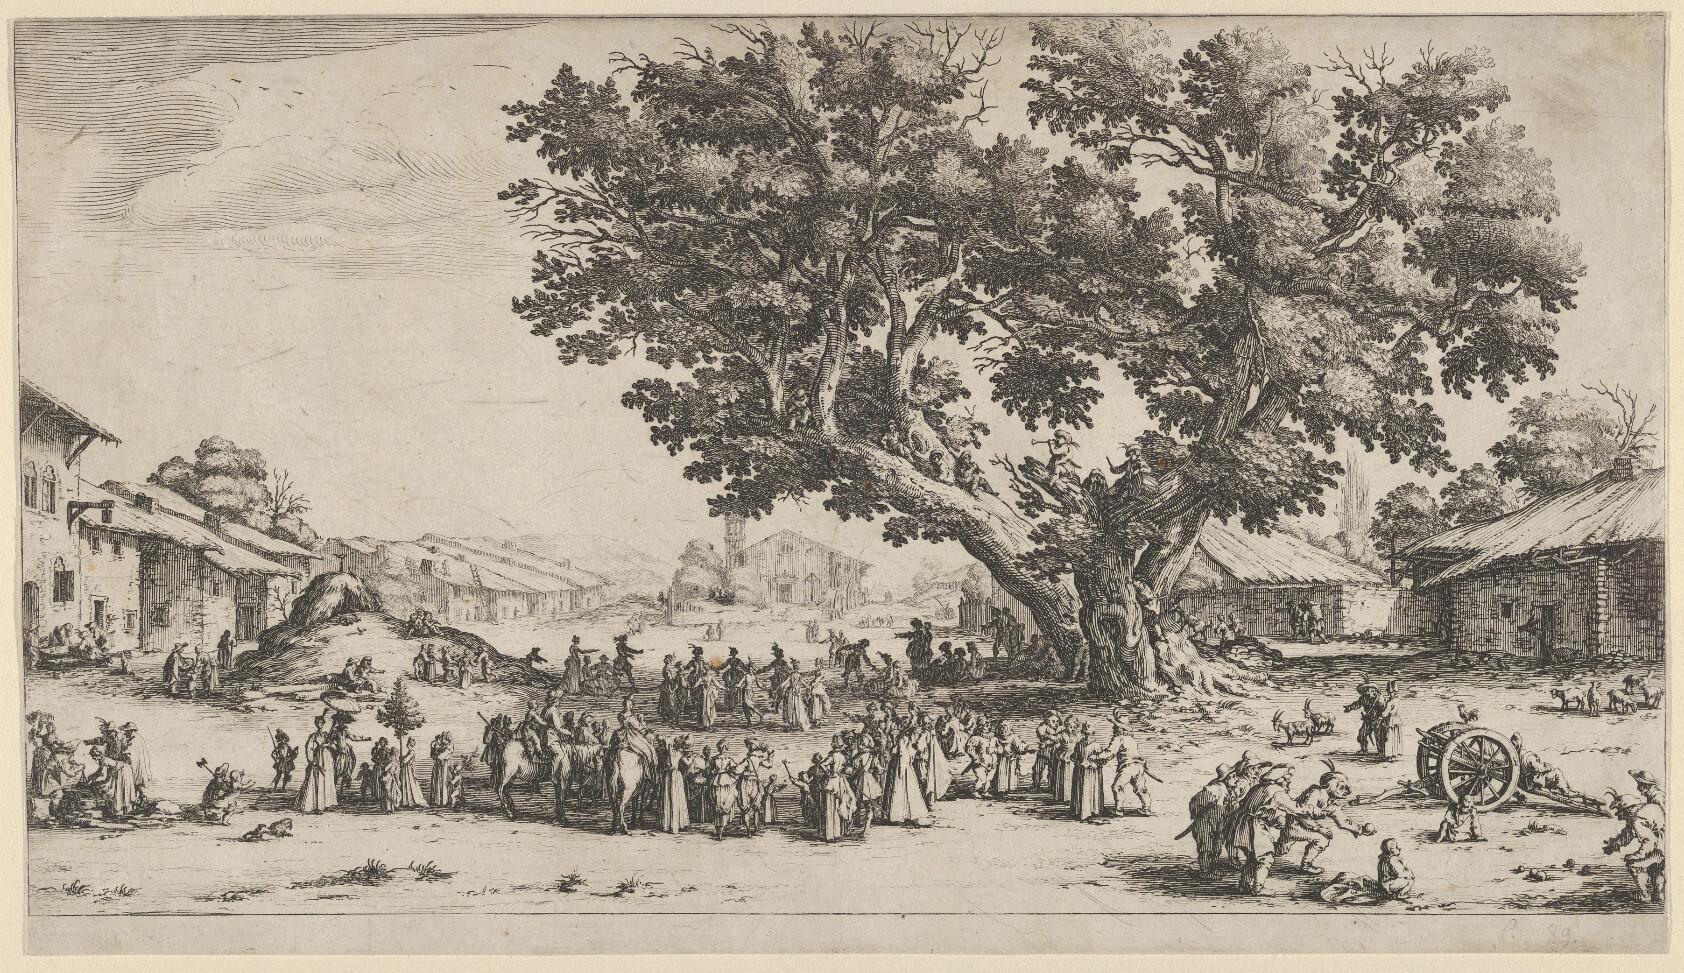 a may day celebration around a tree